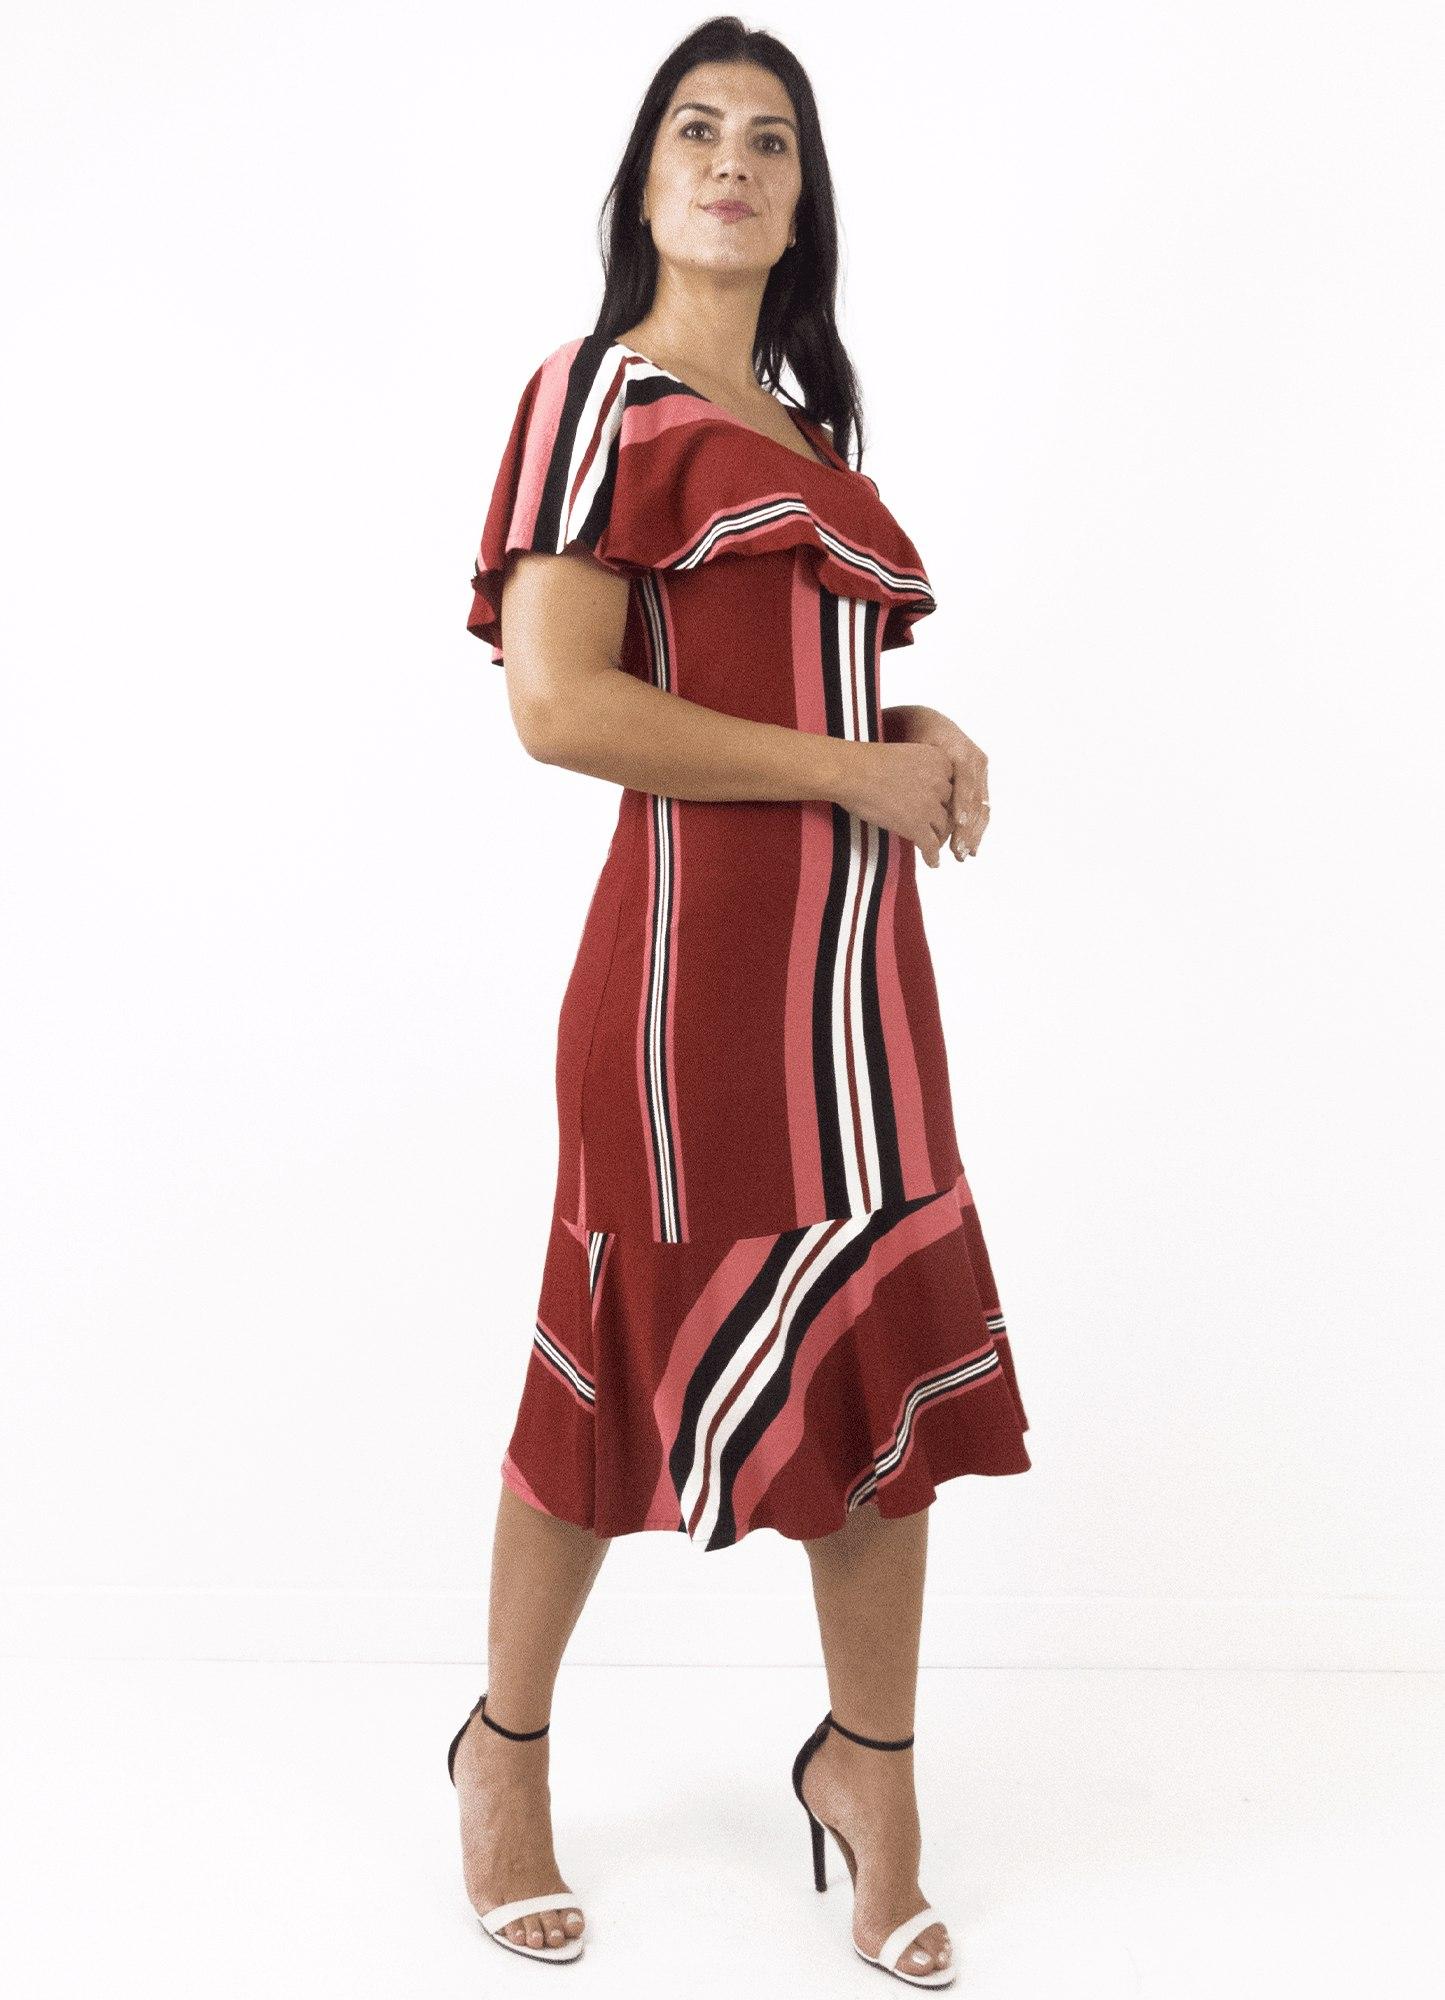 Vestido Feminino Midi Crepe Listrado Ombro só Com Babado